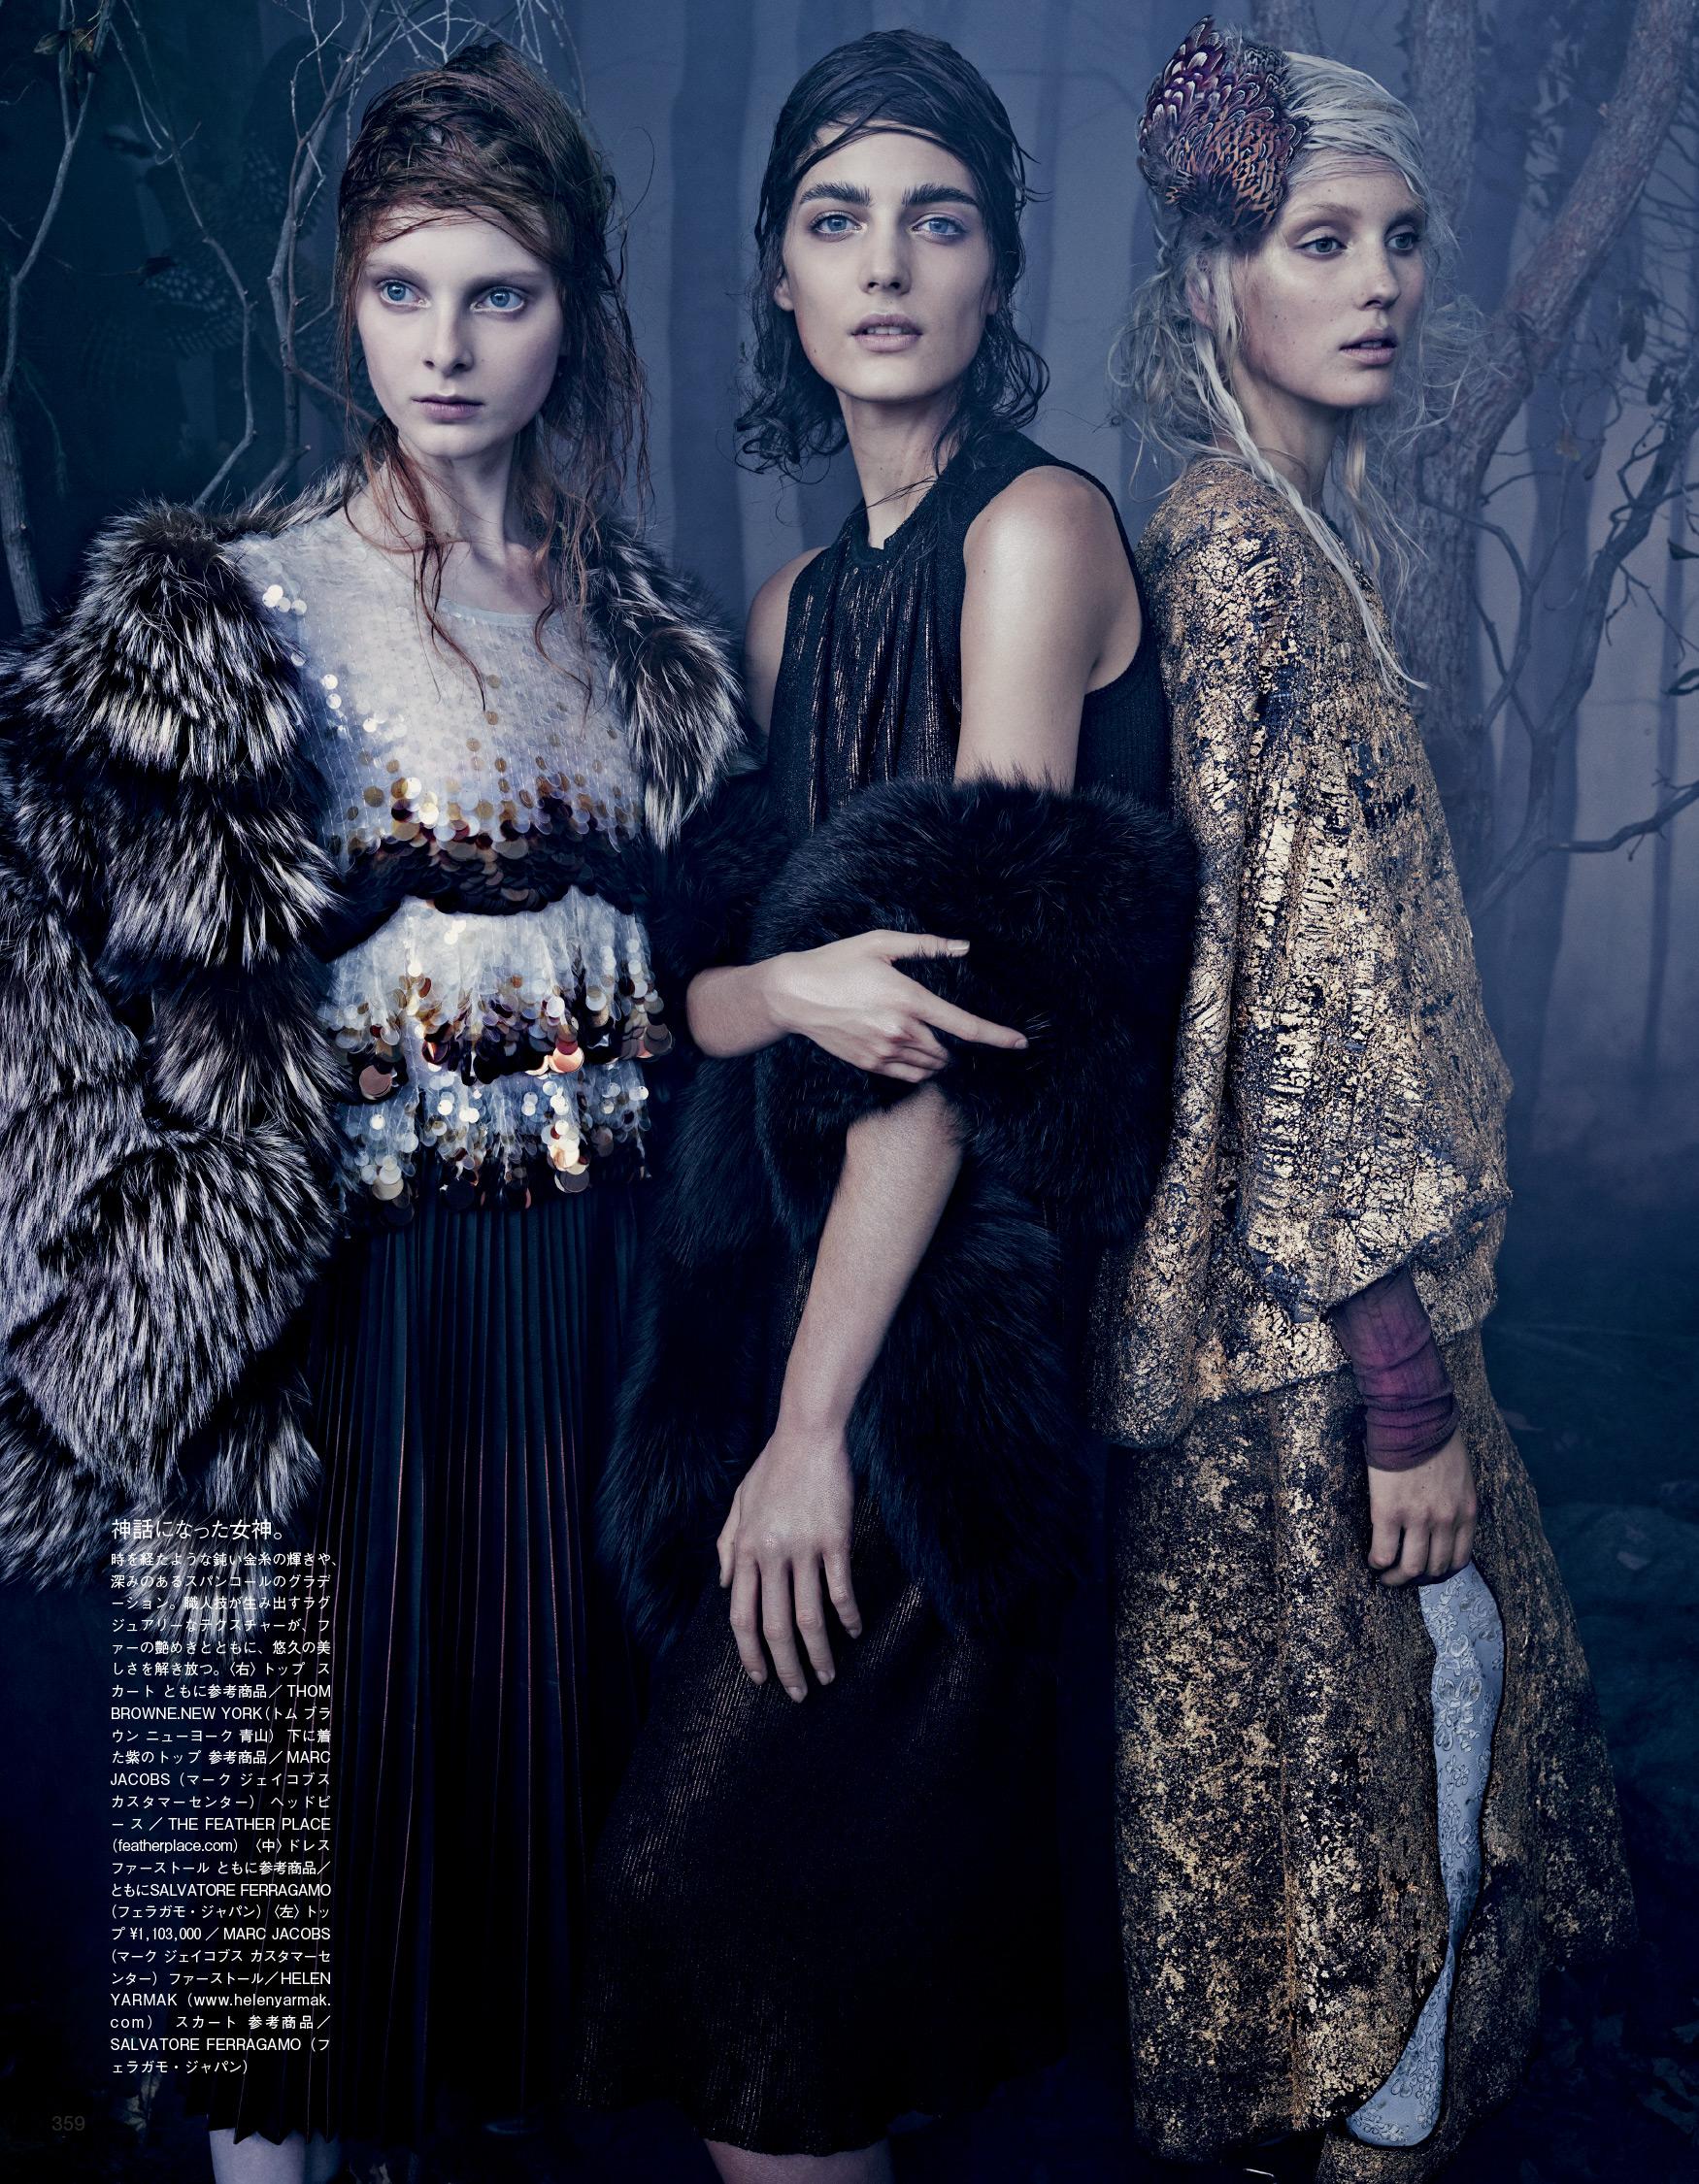 Giovanna-Battaglia-Into-The-Woods-Vogue-Japan-Emma-Summerton-08.jpg